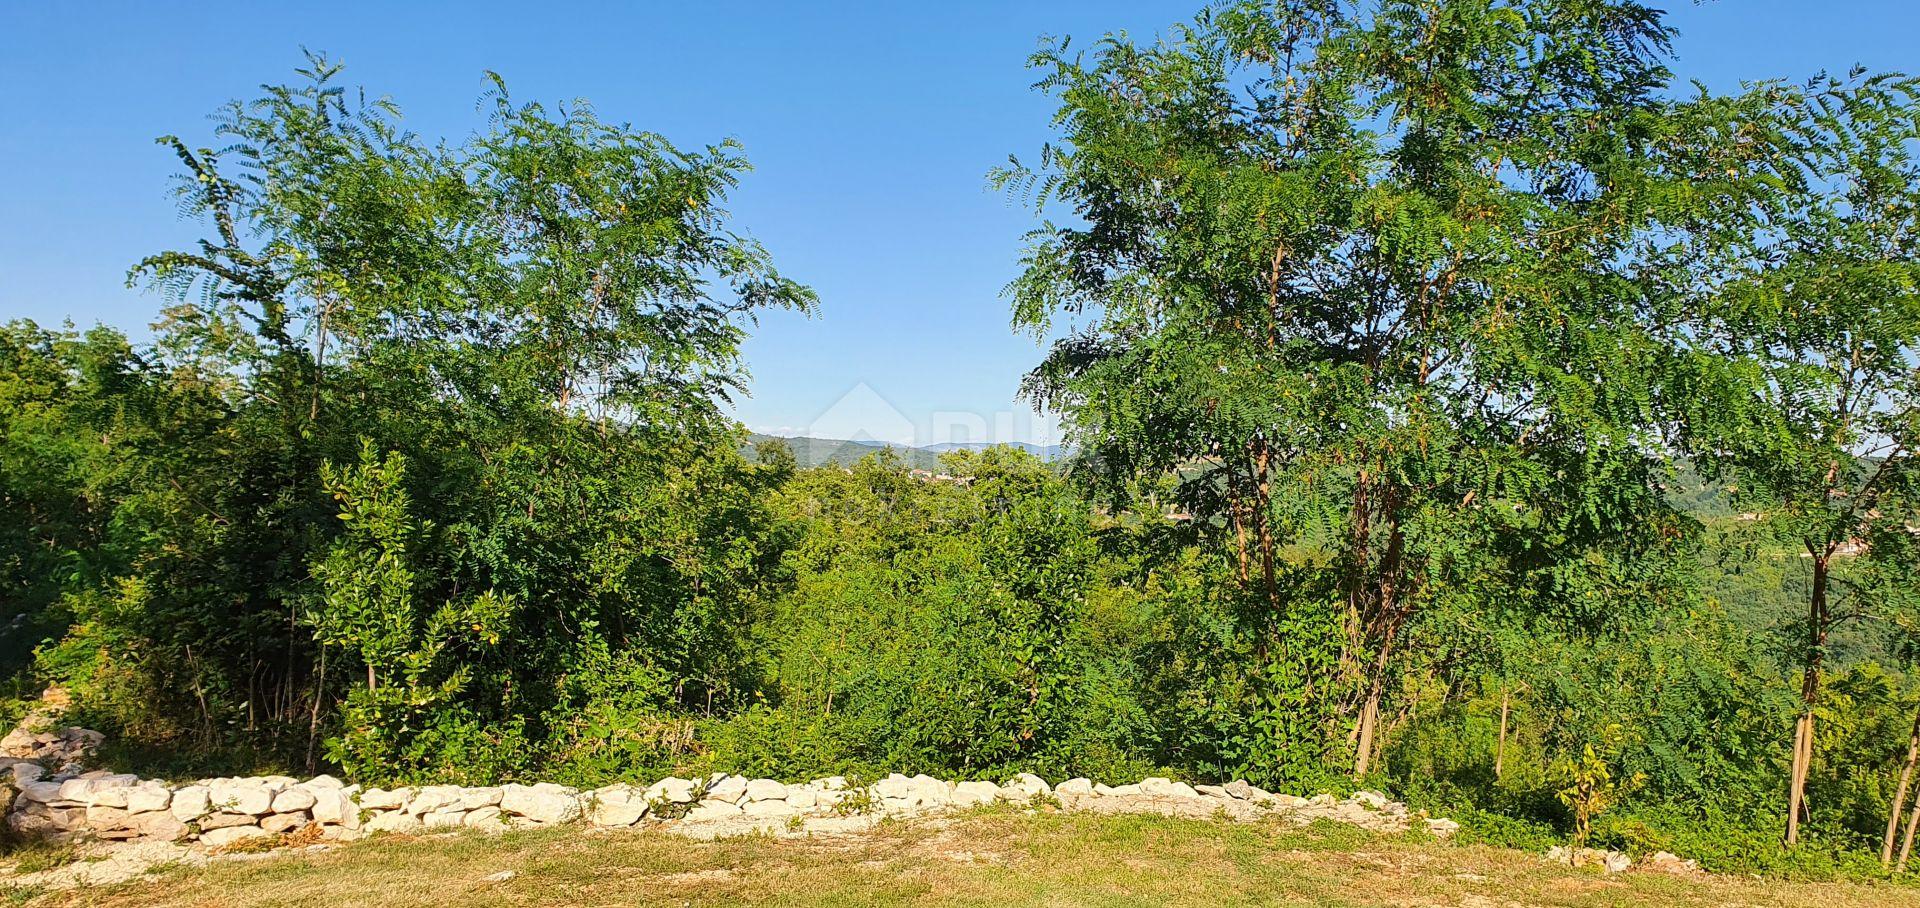 ISTRA, LABIN - Građevinsko zemljište 540 m2